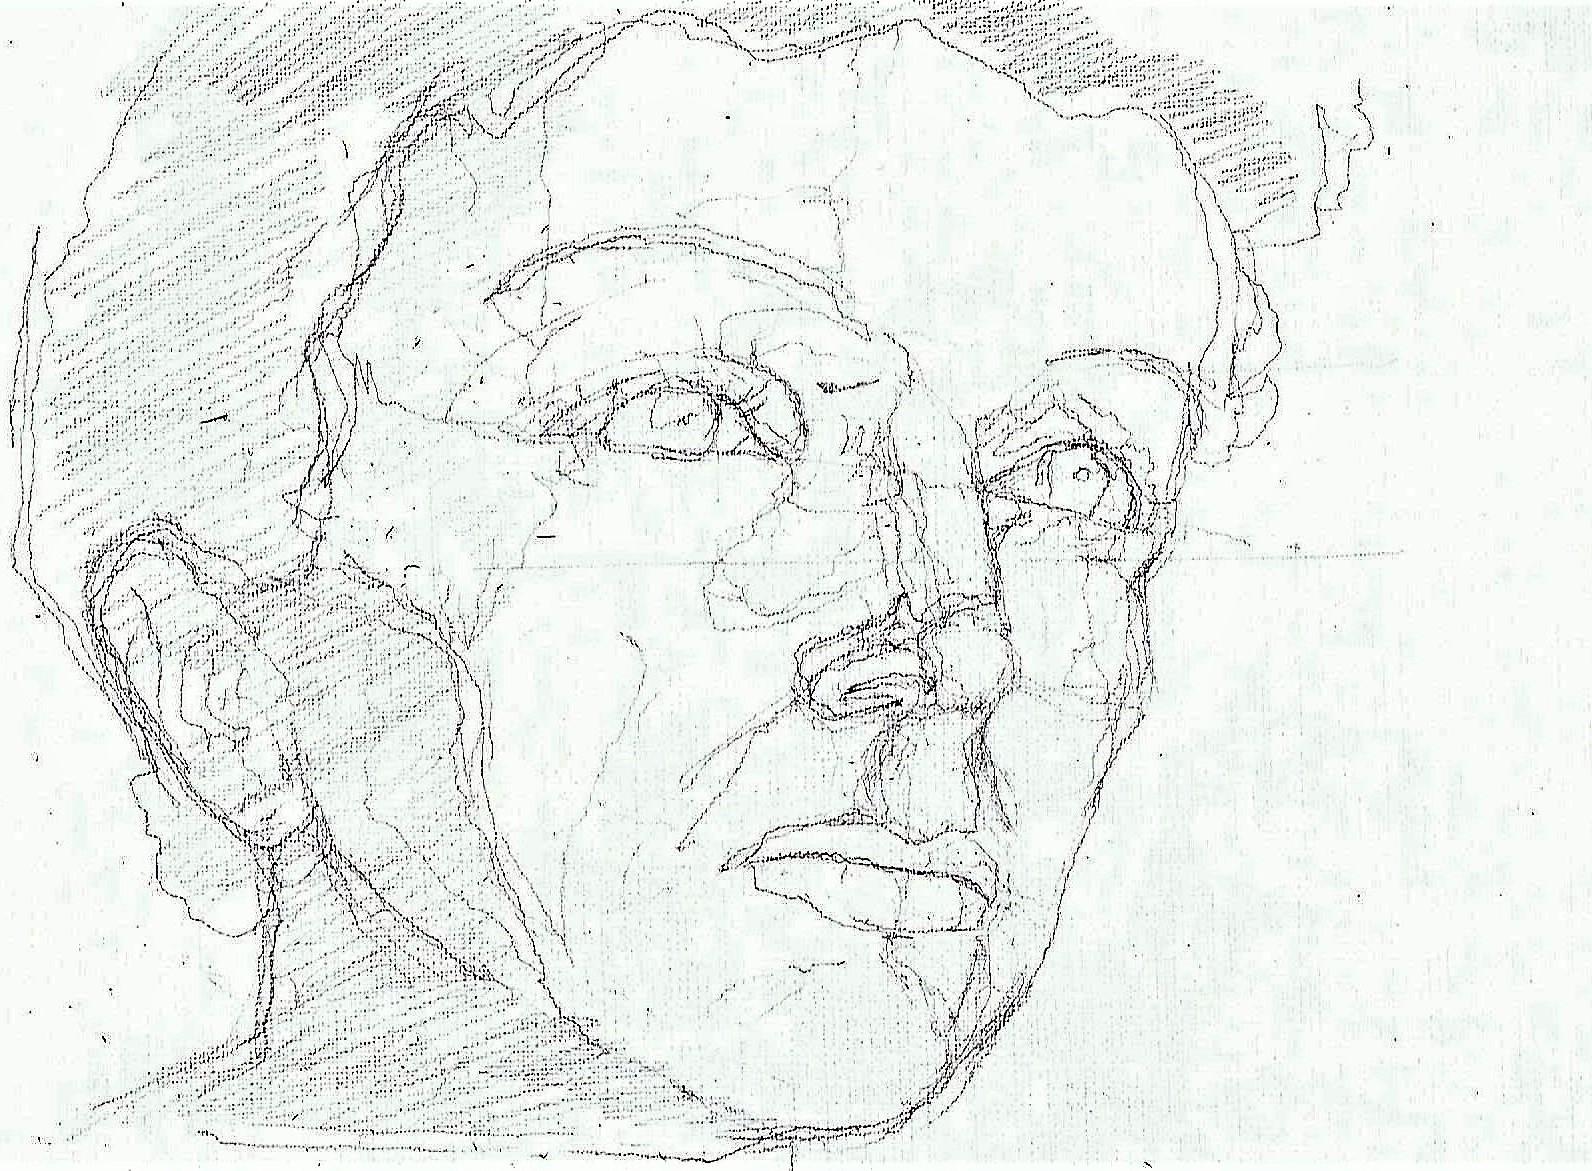 365 dagen een portret 62 Edith Piaf, zangeres Potlood 19c25